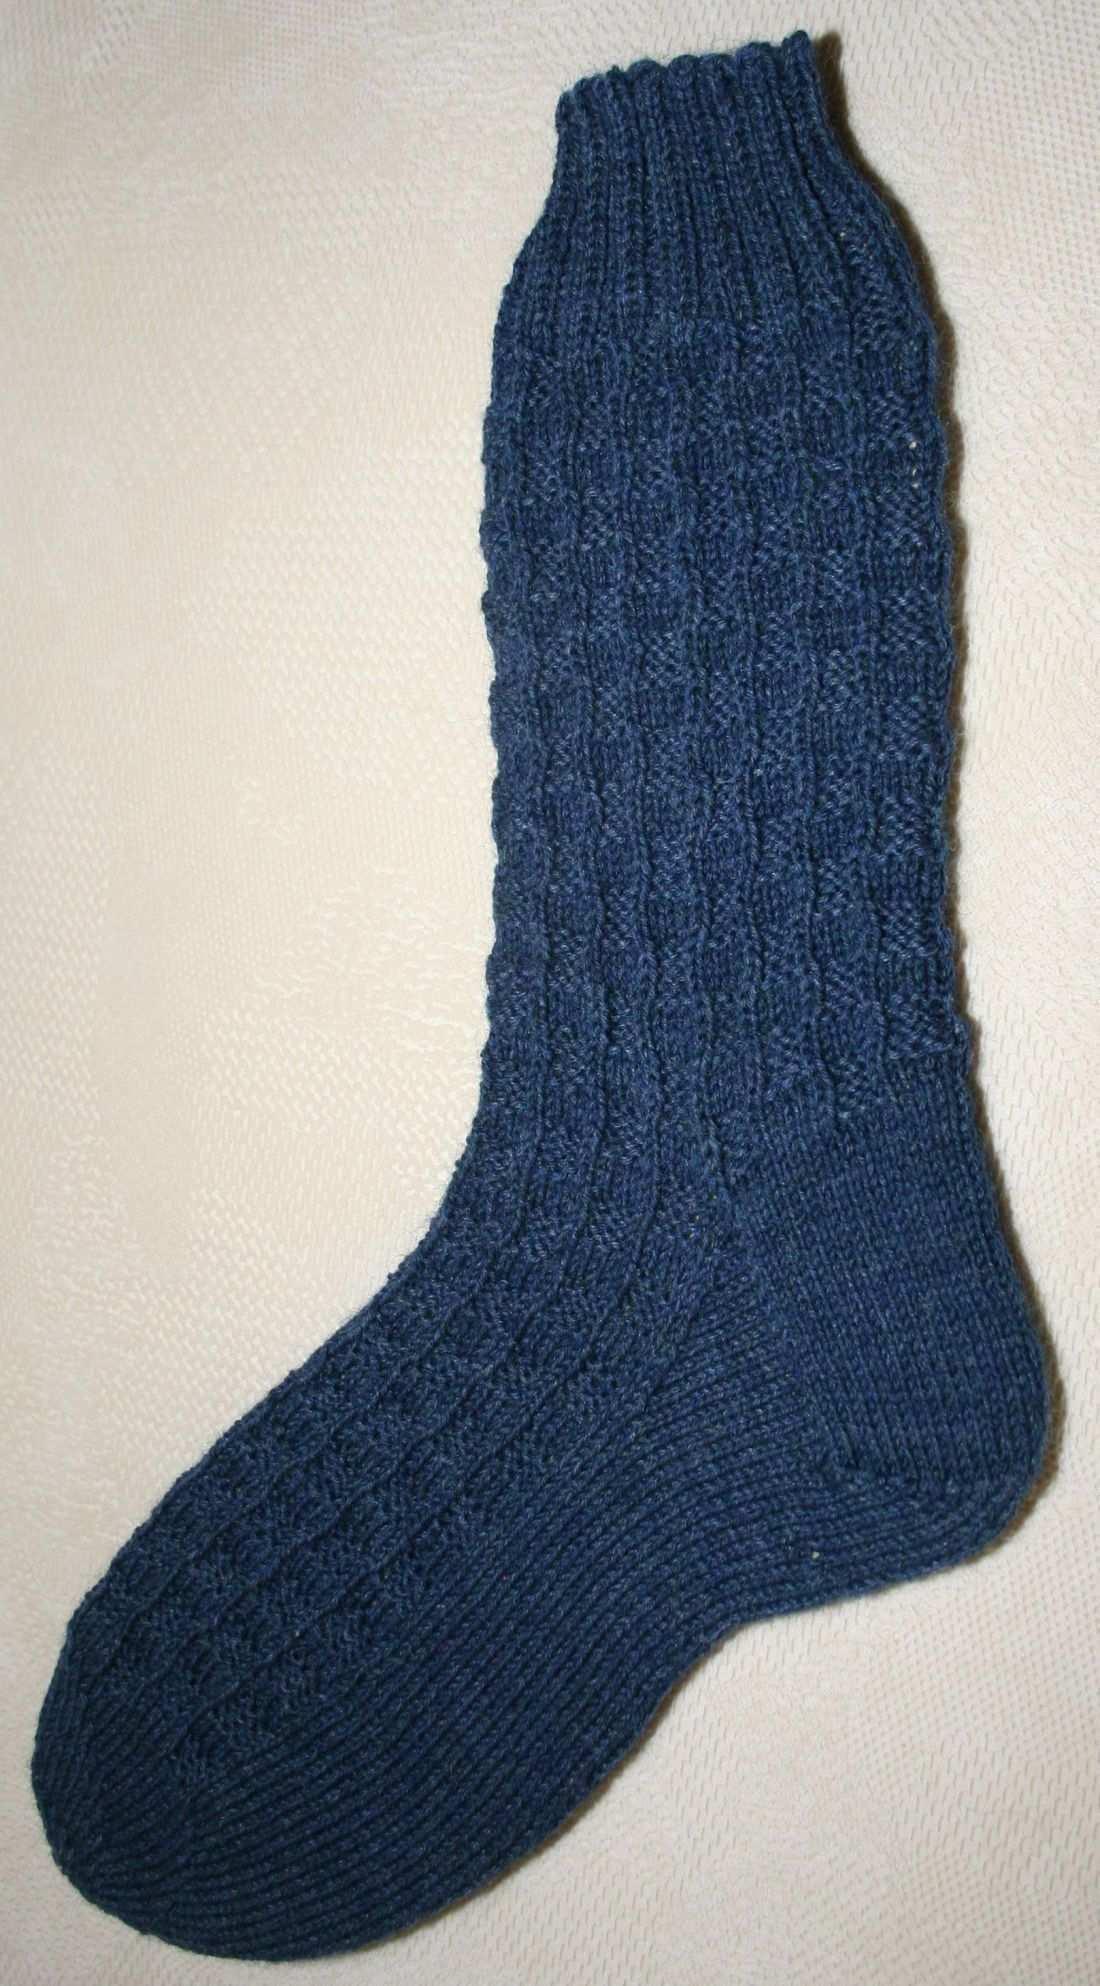 Herrensocken Sockenmustert Eri Heikes Handarbeiten Herren Socken Herrensocken Socken Stricken Anfanger